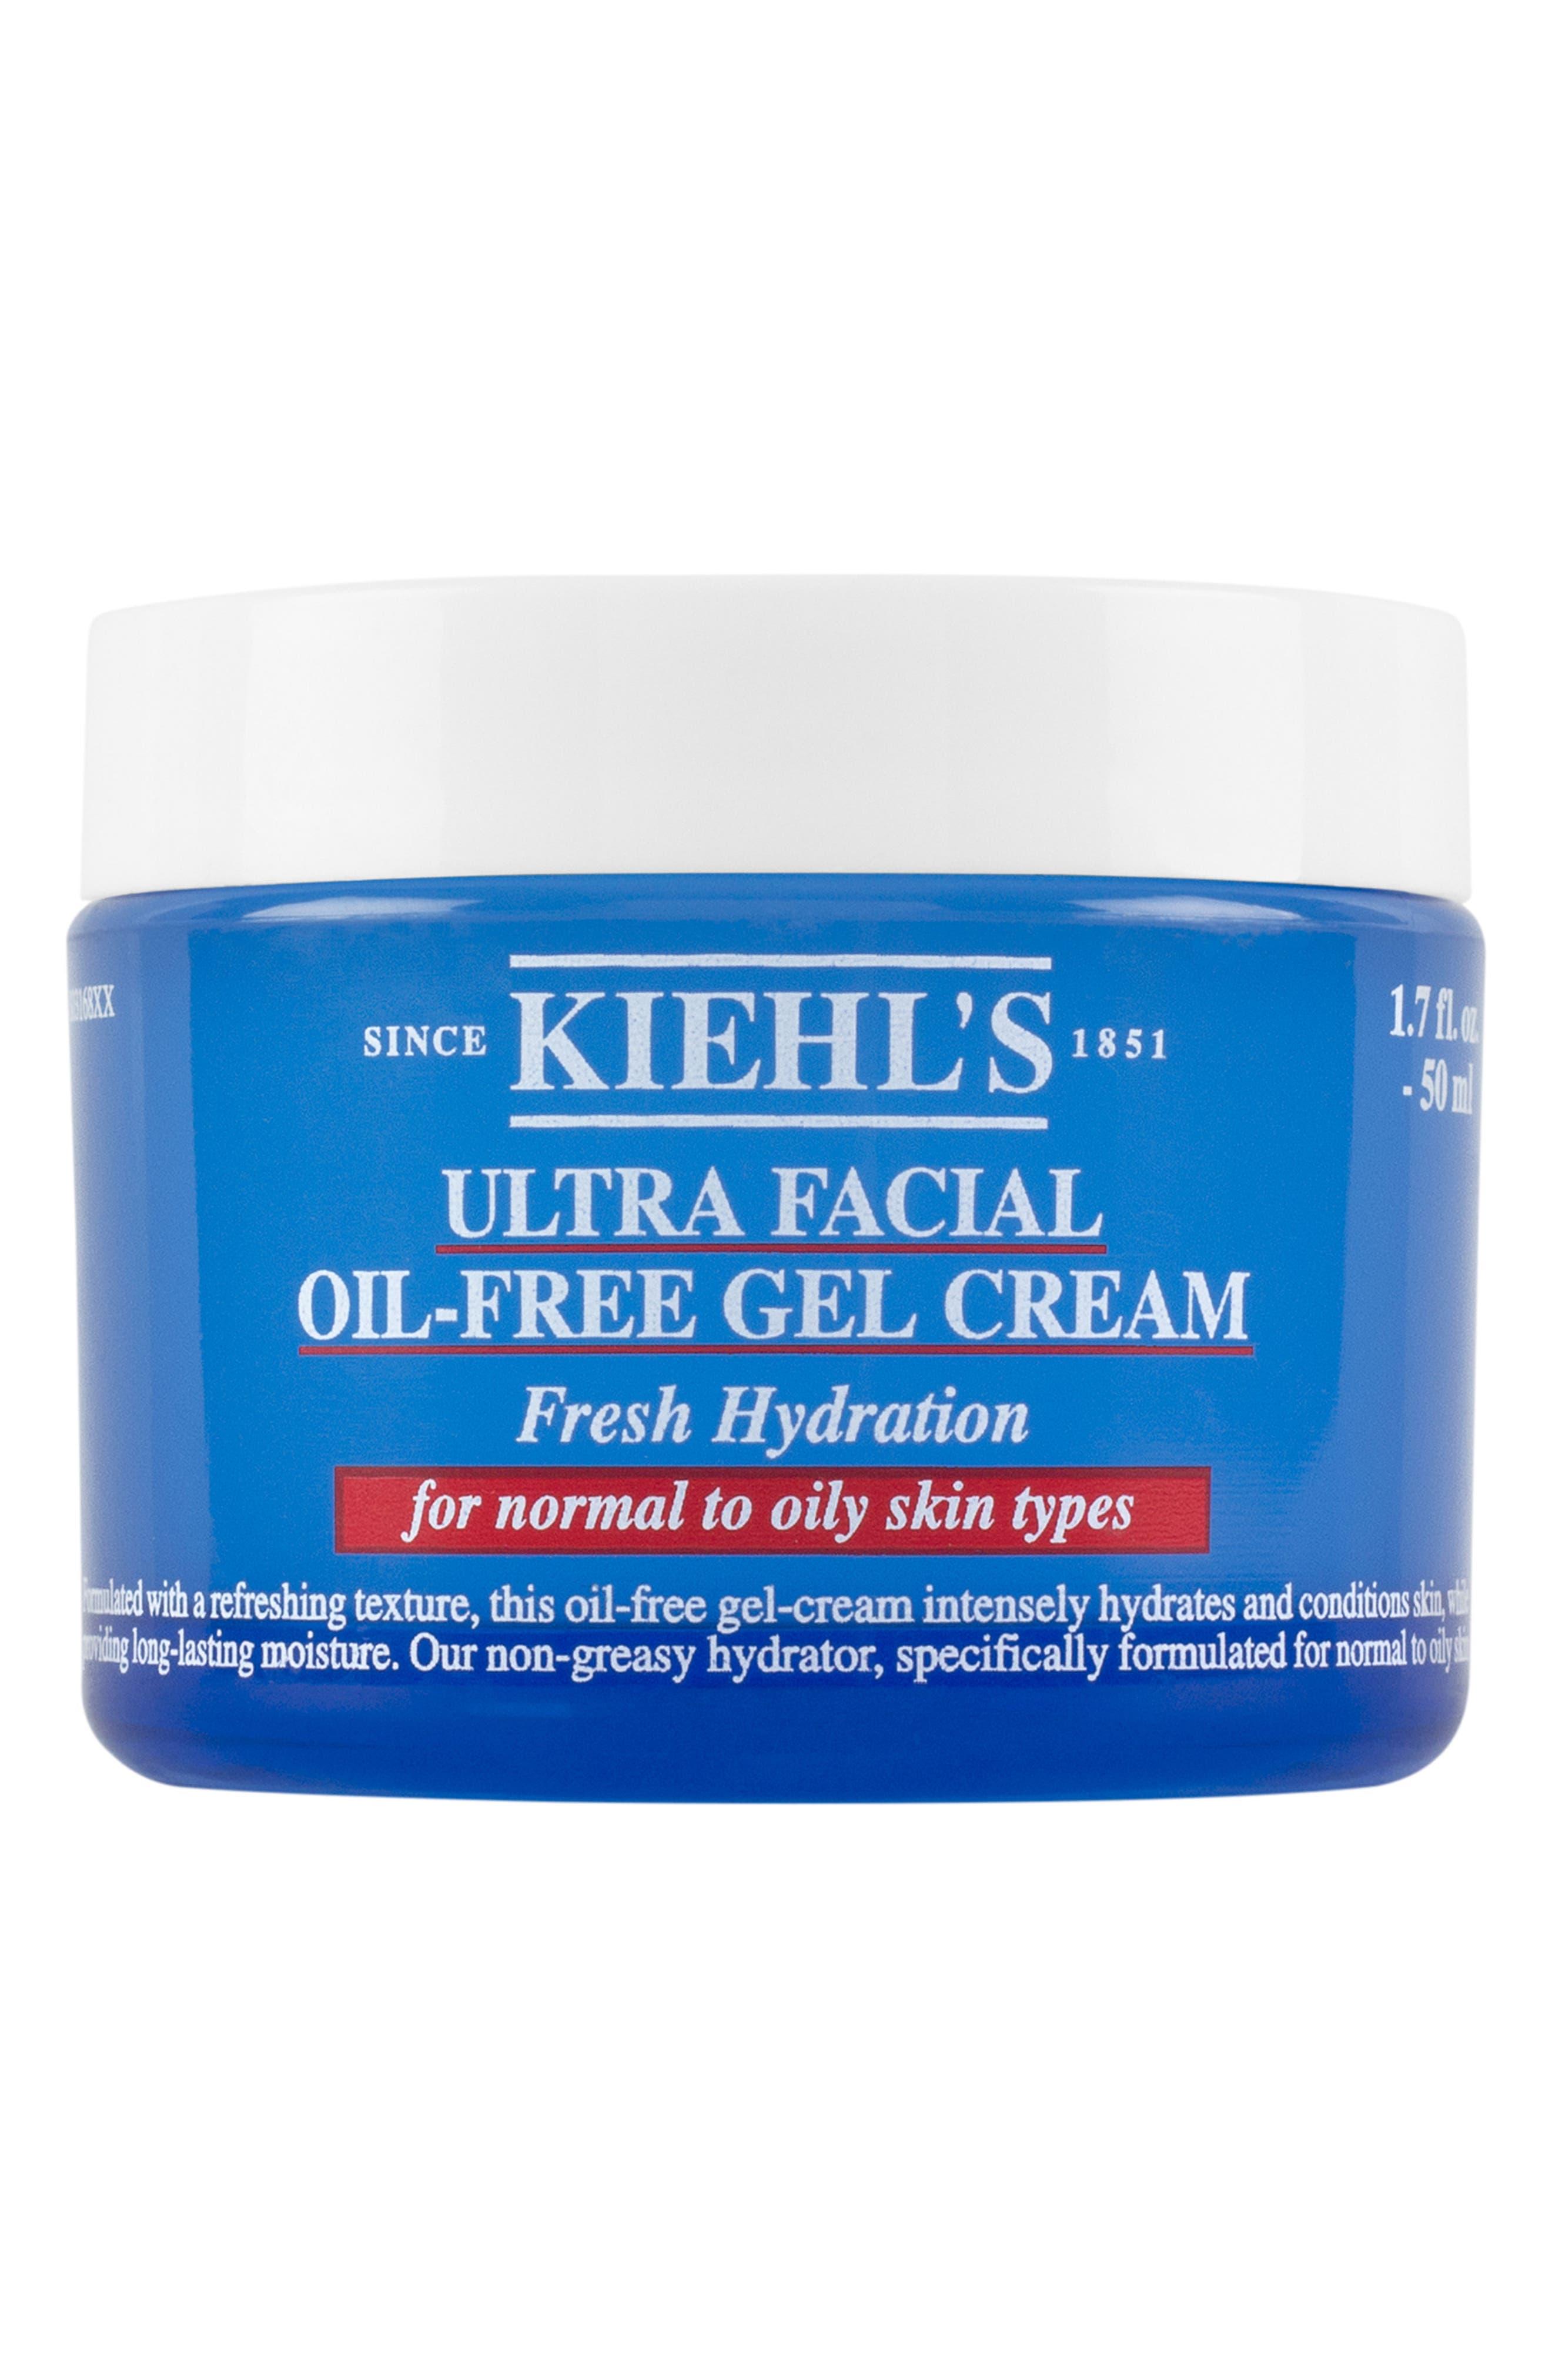 'Ultra Facial' Oil-Free Gel Cream,                             Alternate thumbnail 2, color,                             NO COLOR